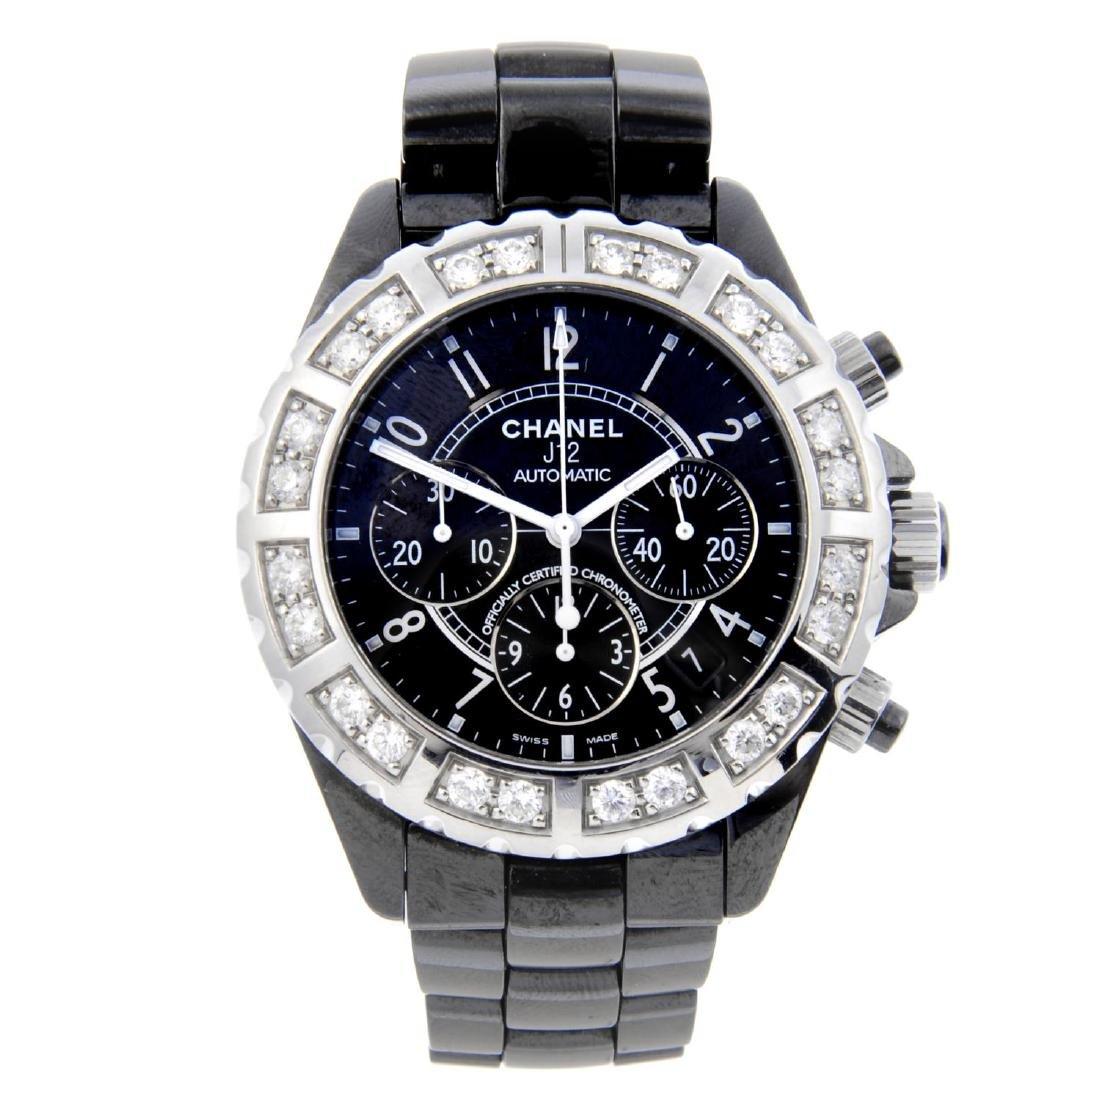 CHANEL - a gentleman's J12 chronograph bracelet watch.